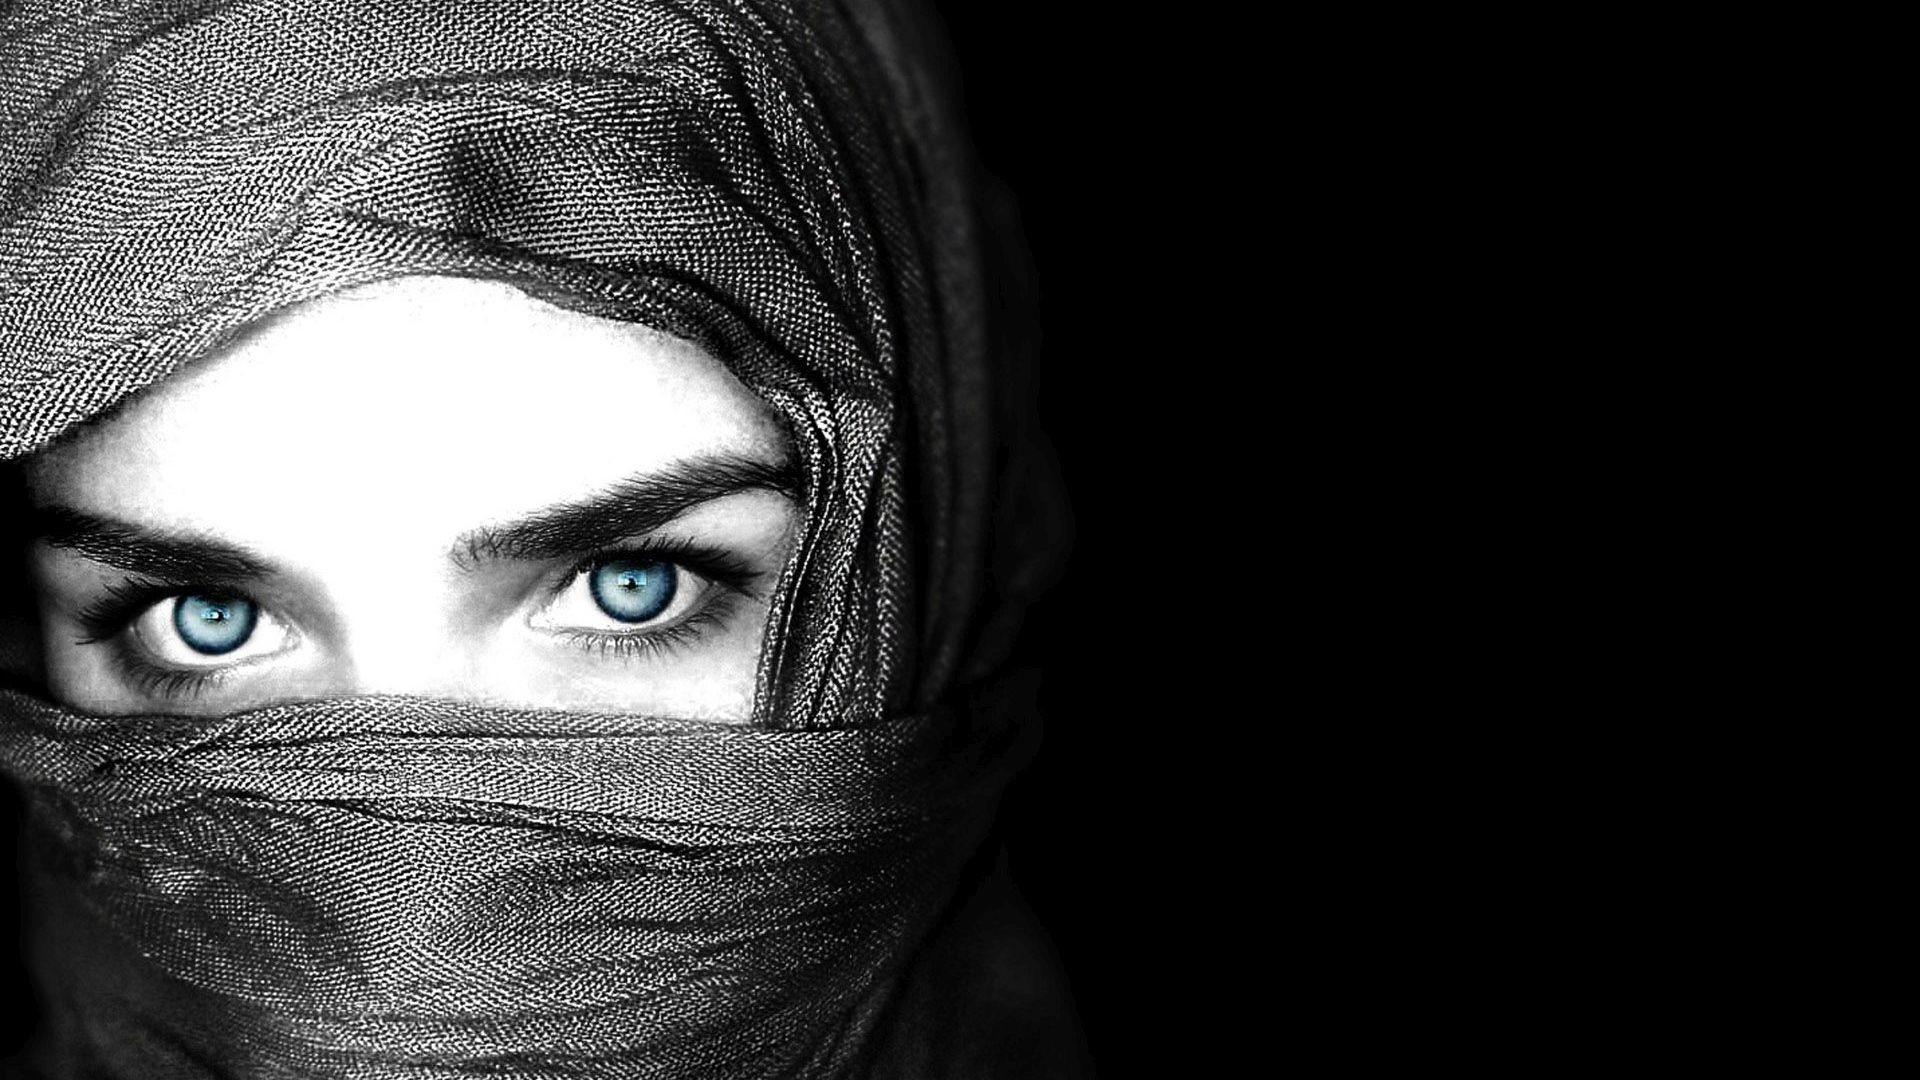 Blue Eye Wallpaper (75+ Images